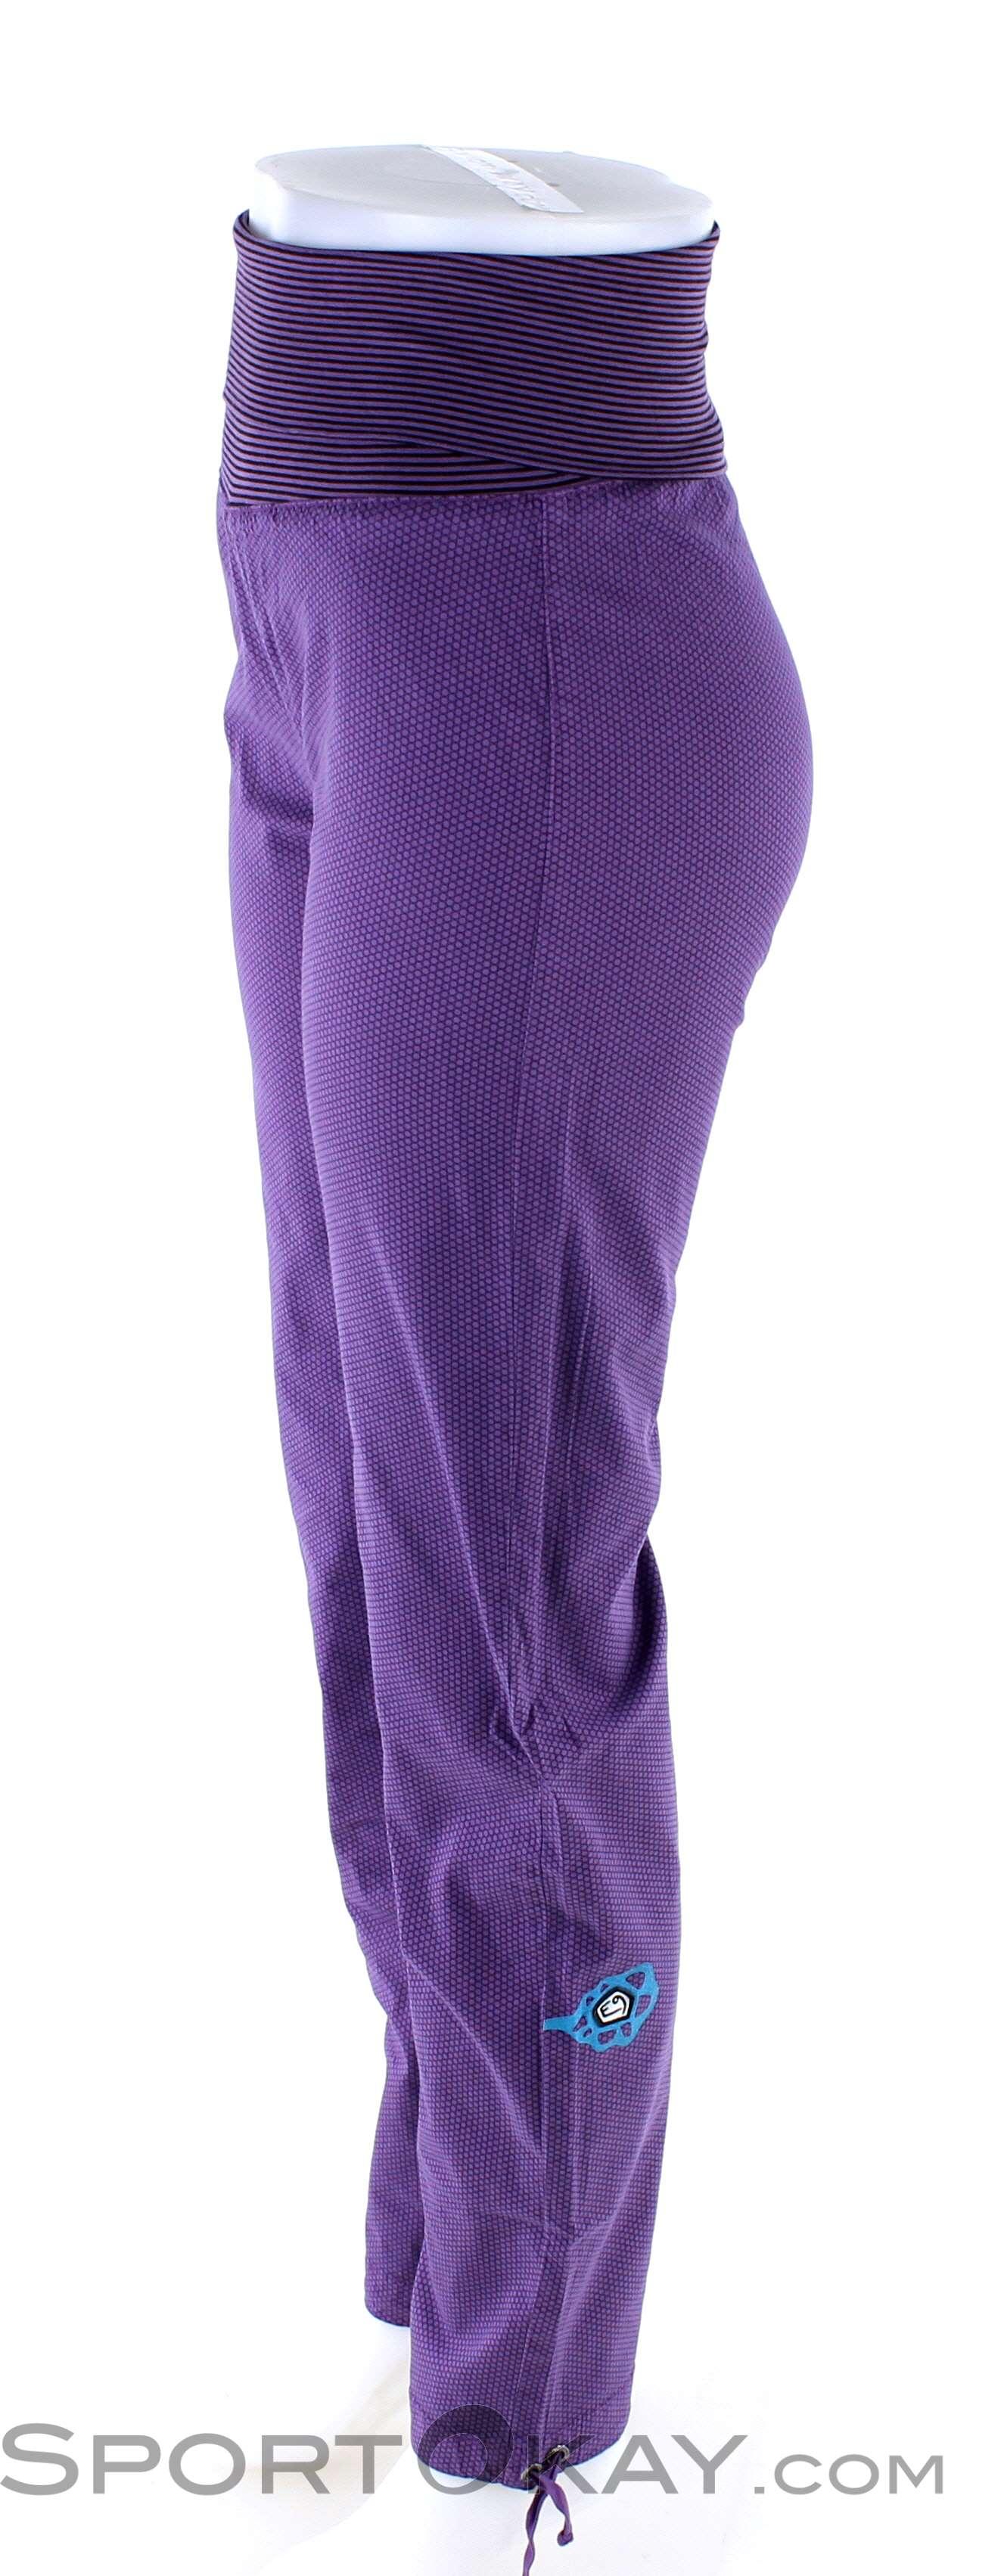 Diamond Cut GW Black /& Purple Top M Active Wear